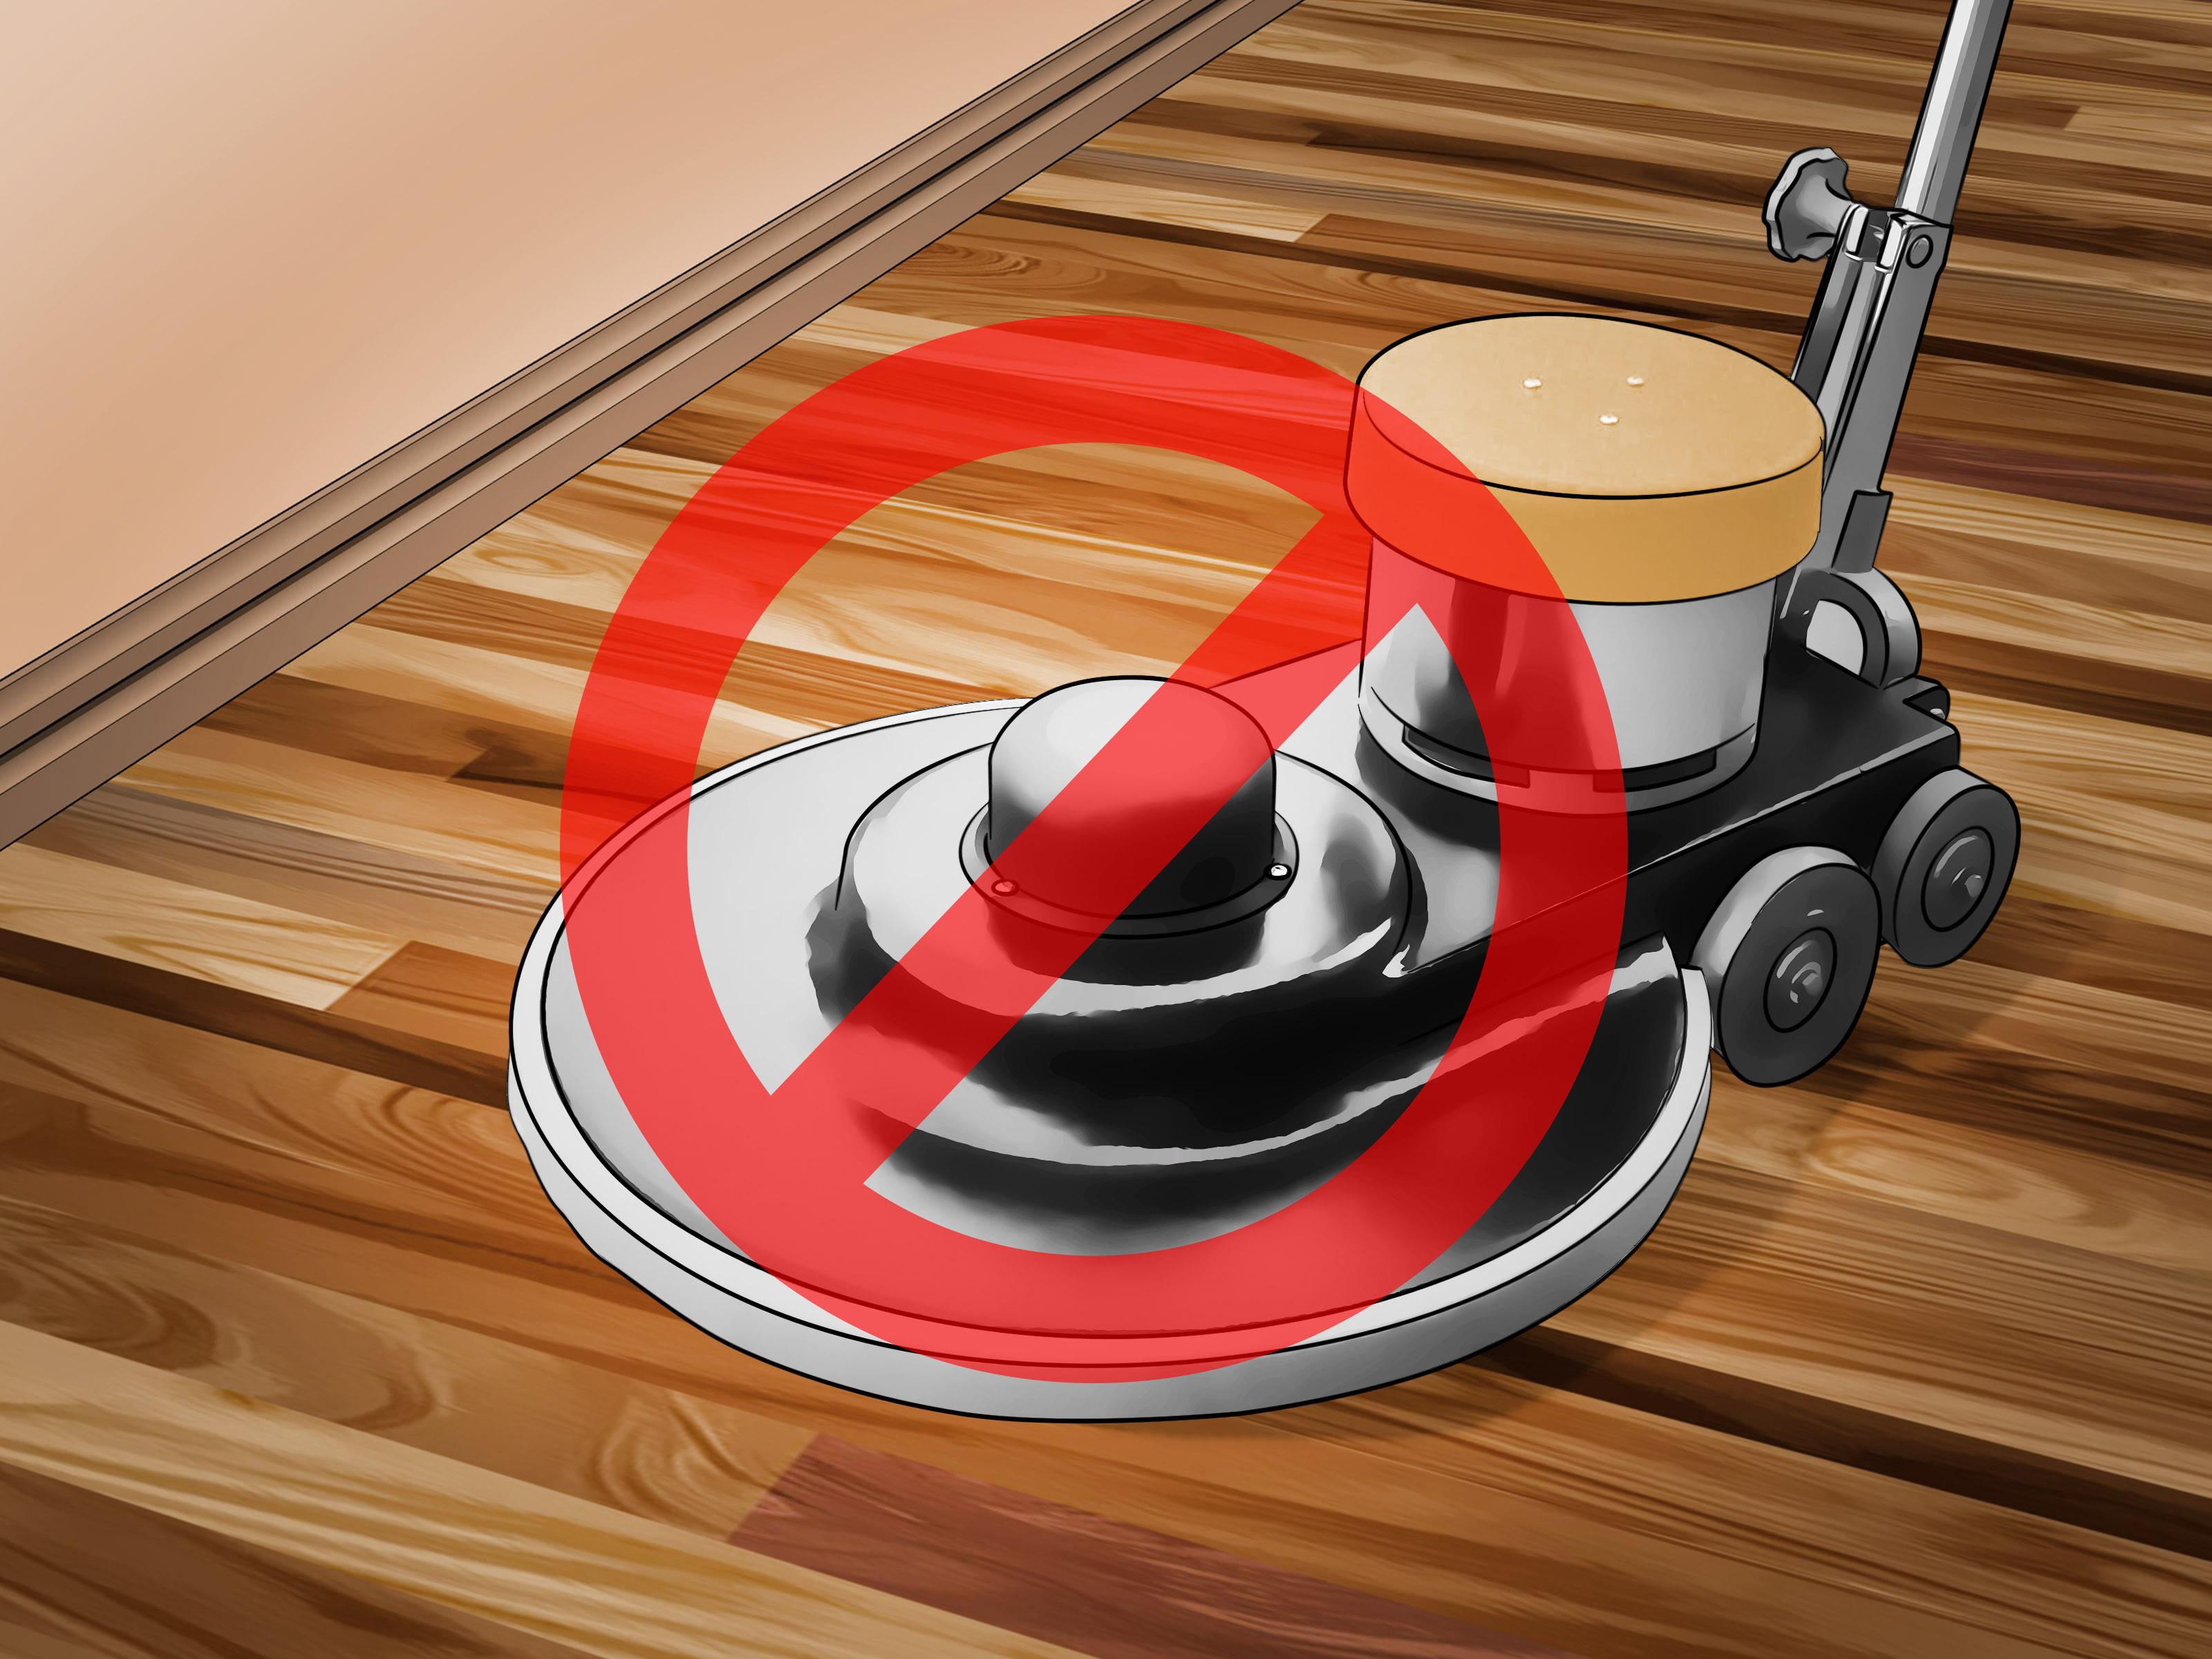 hardwood floor restore kit of 4 ways to clean polyurethane wood floors wikihow within clean polyurethane wood floors step 15